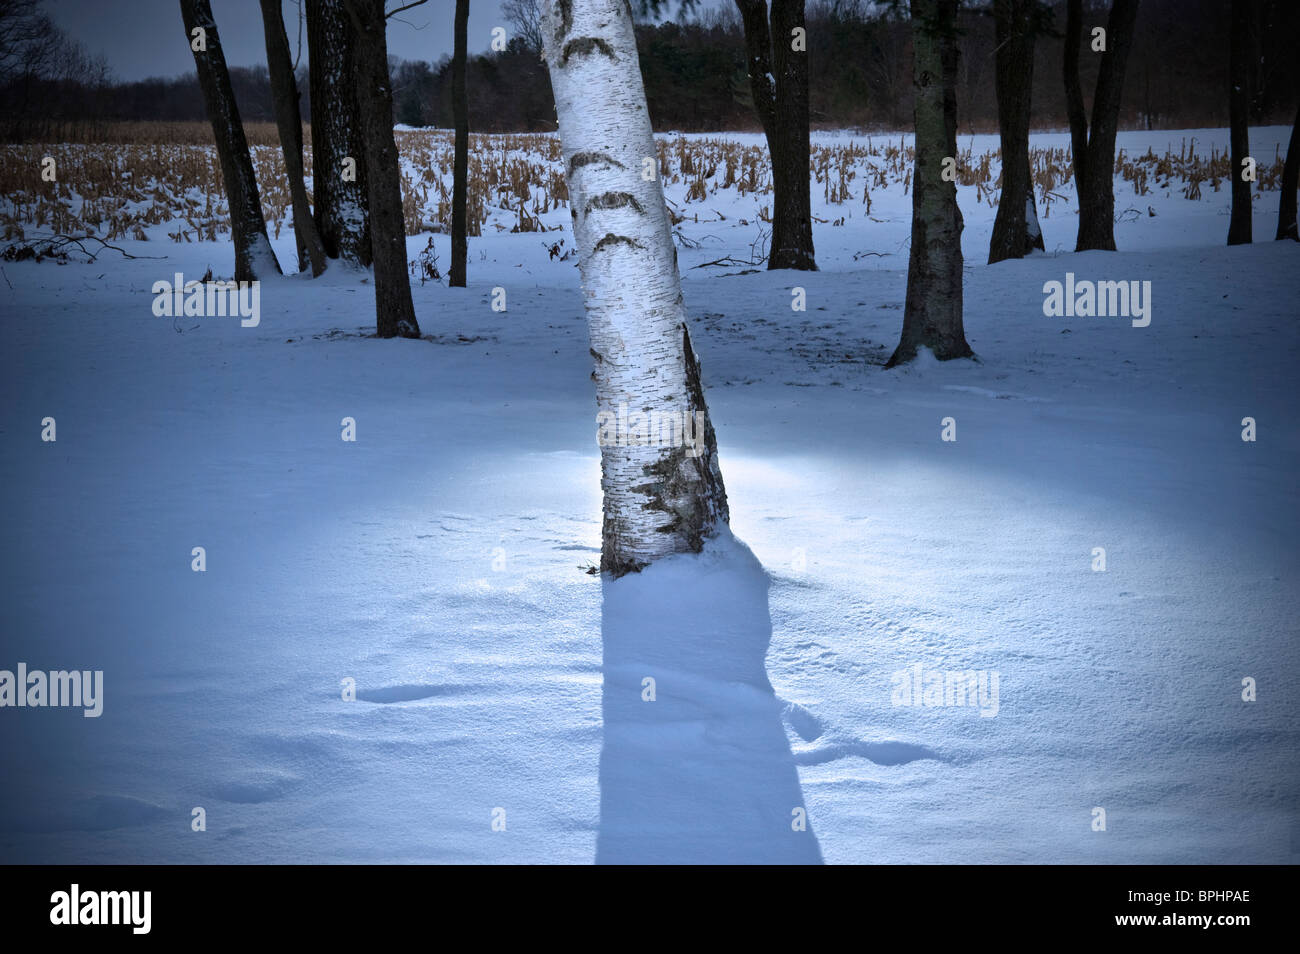 White Birch Tree With Light At Night In Winter, Michigan, USA - Stock Image